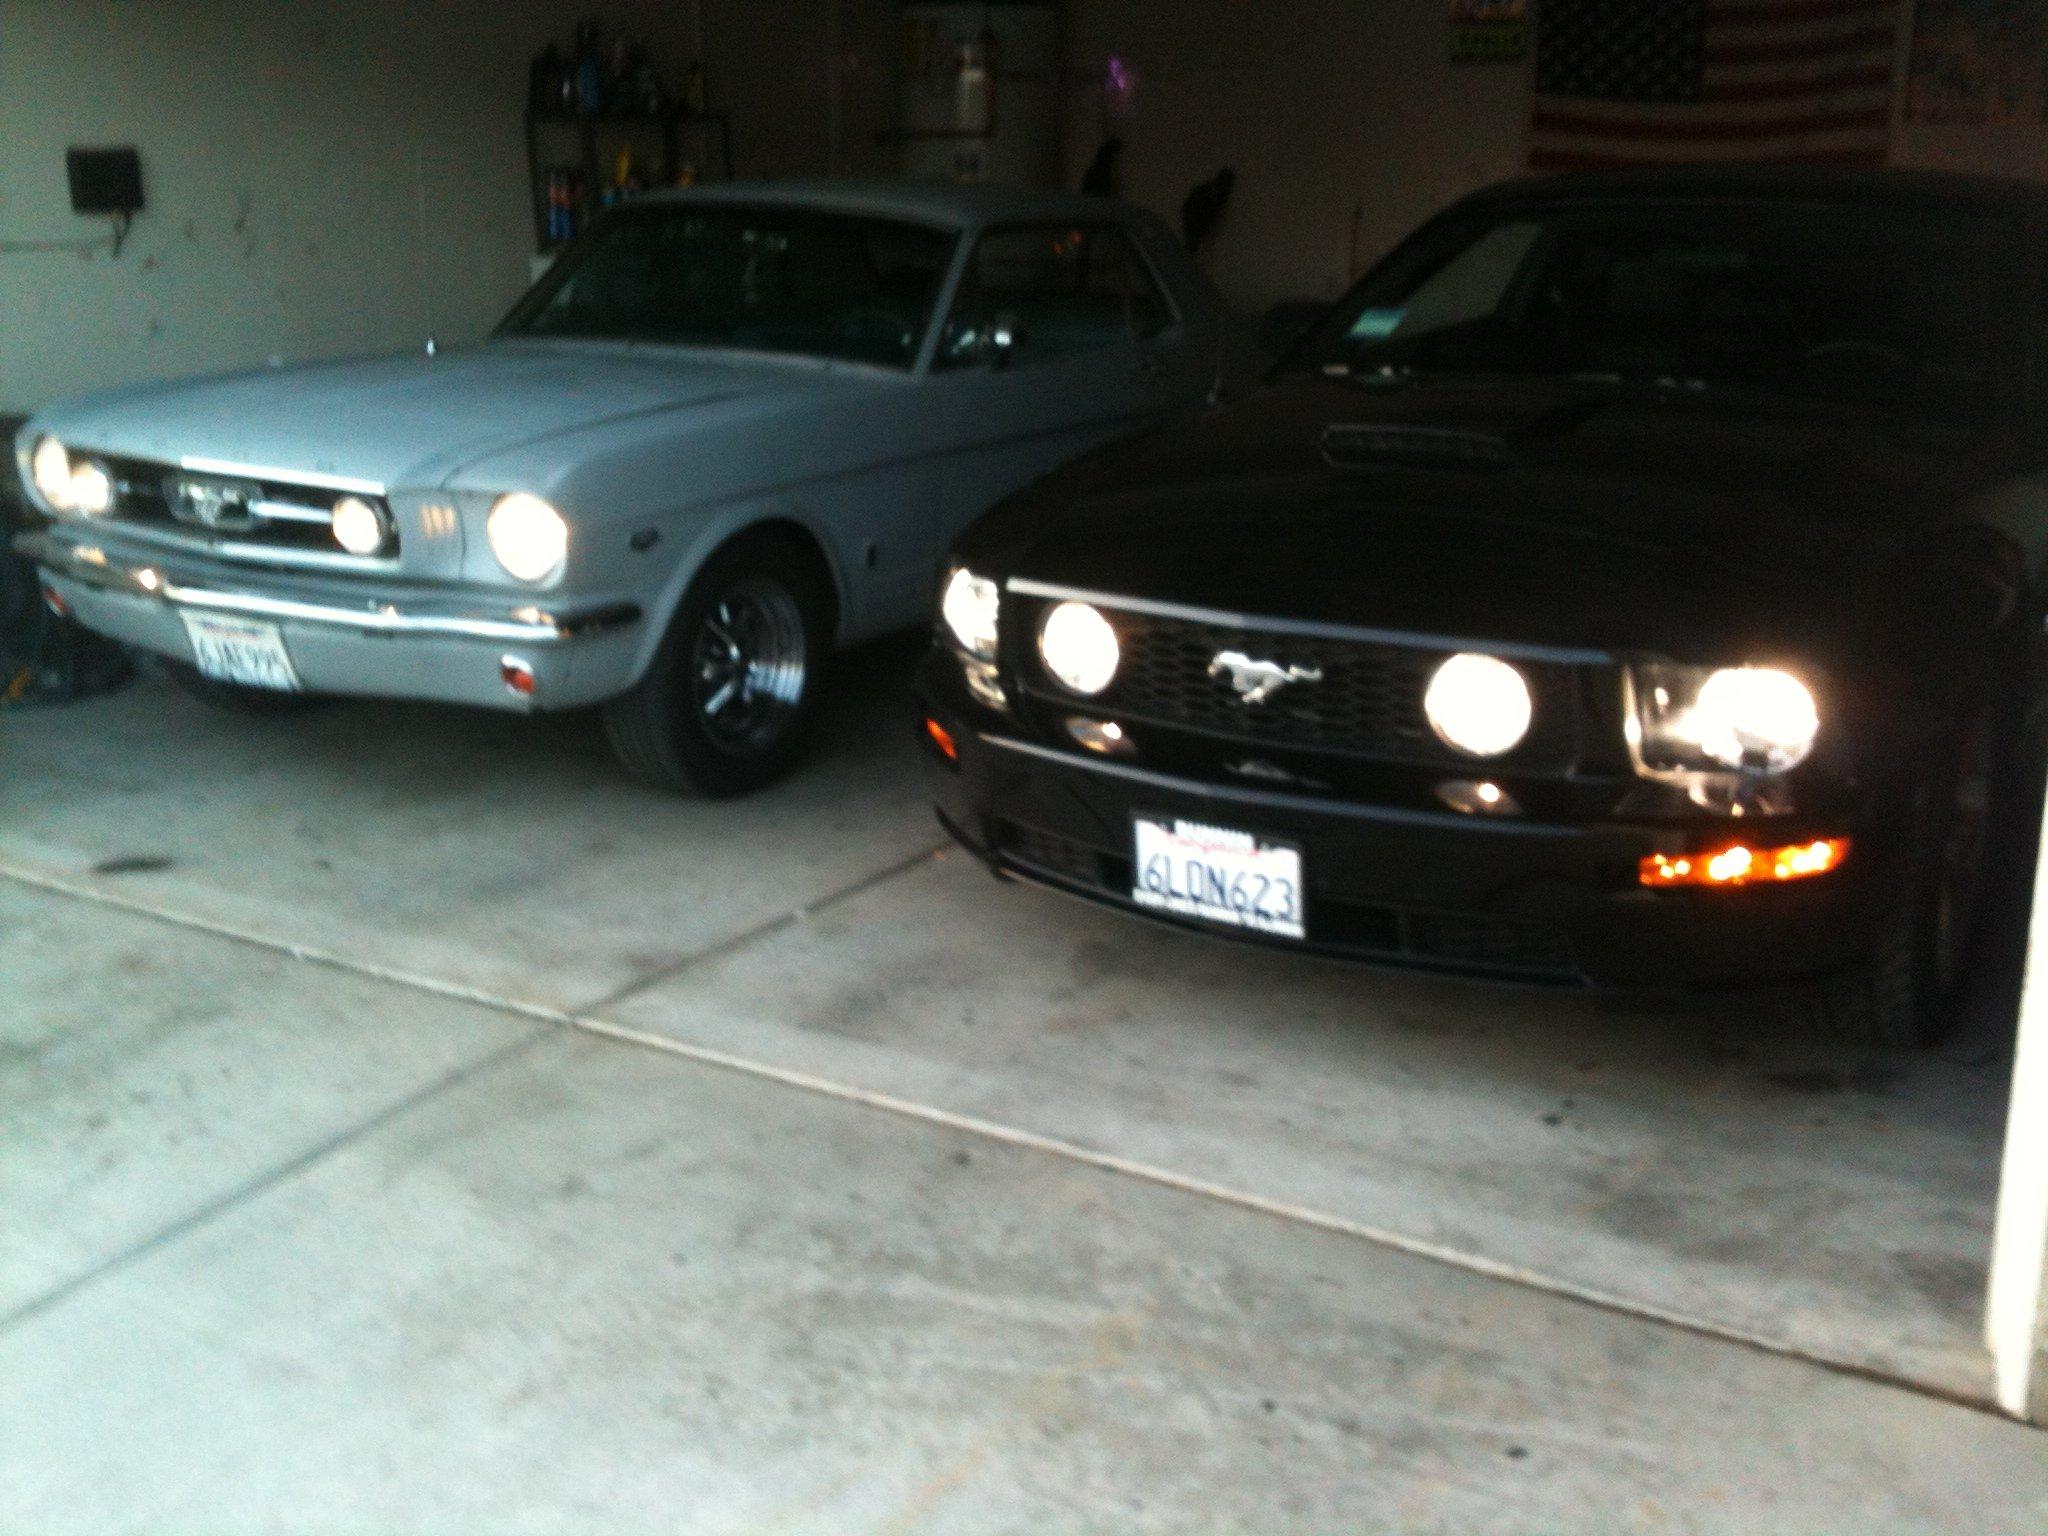 2008 Mustang Gt Hid Headlights And Fog Light Bulbs Ford